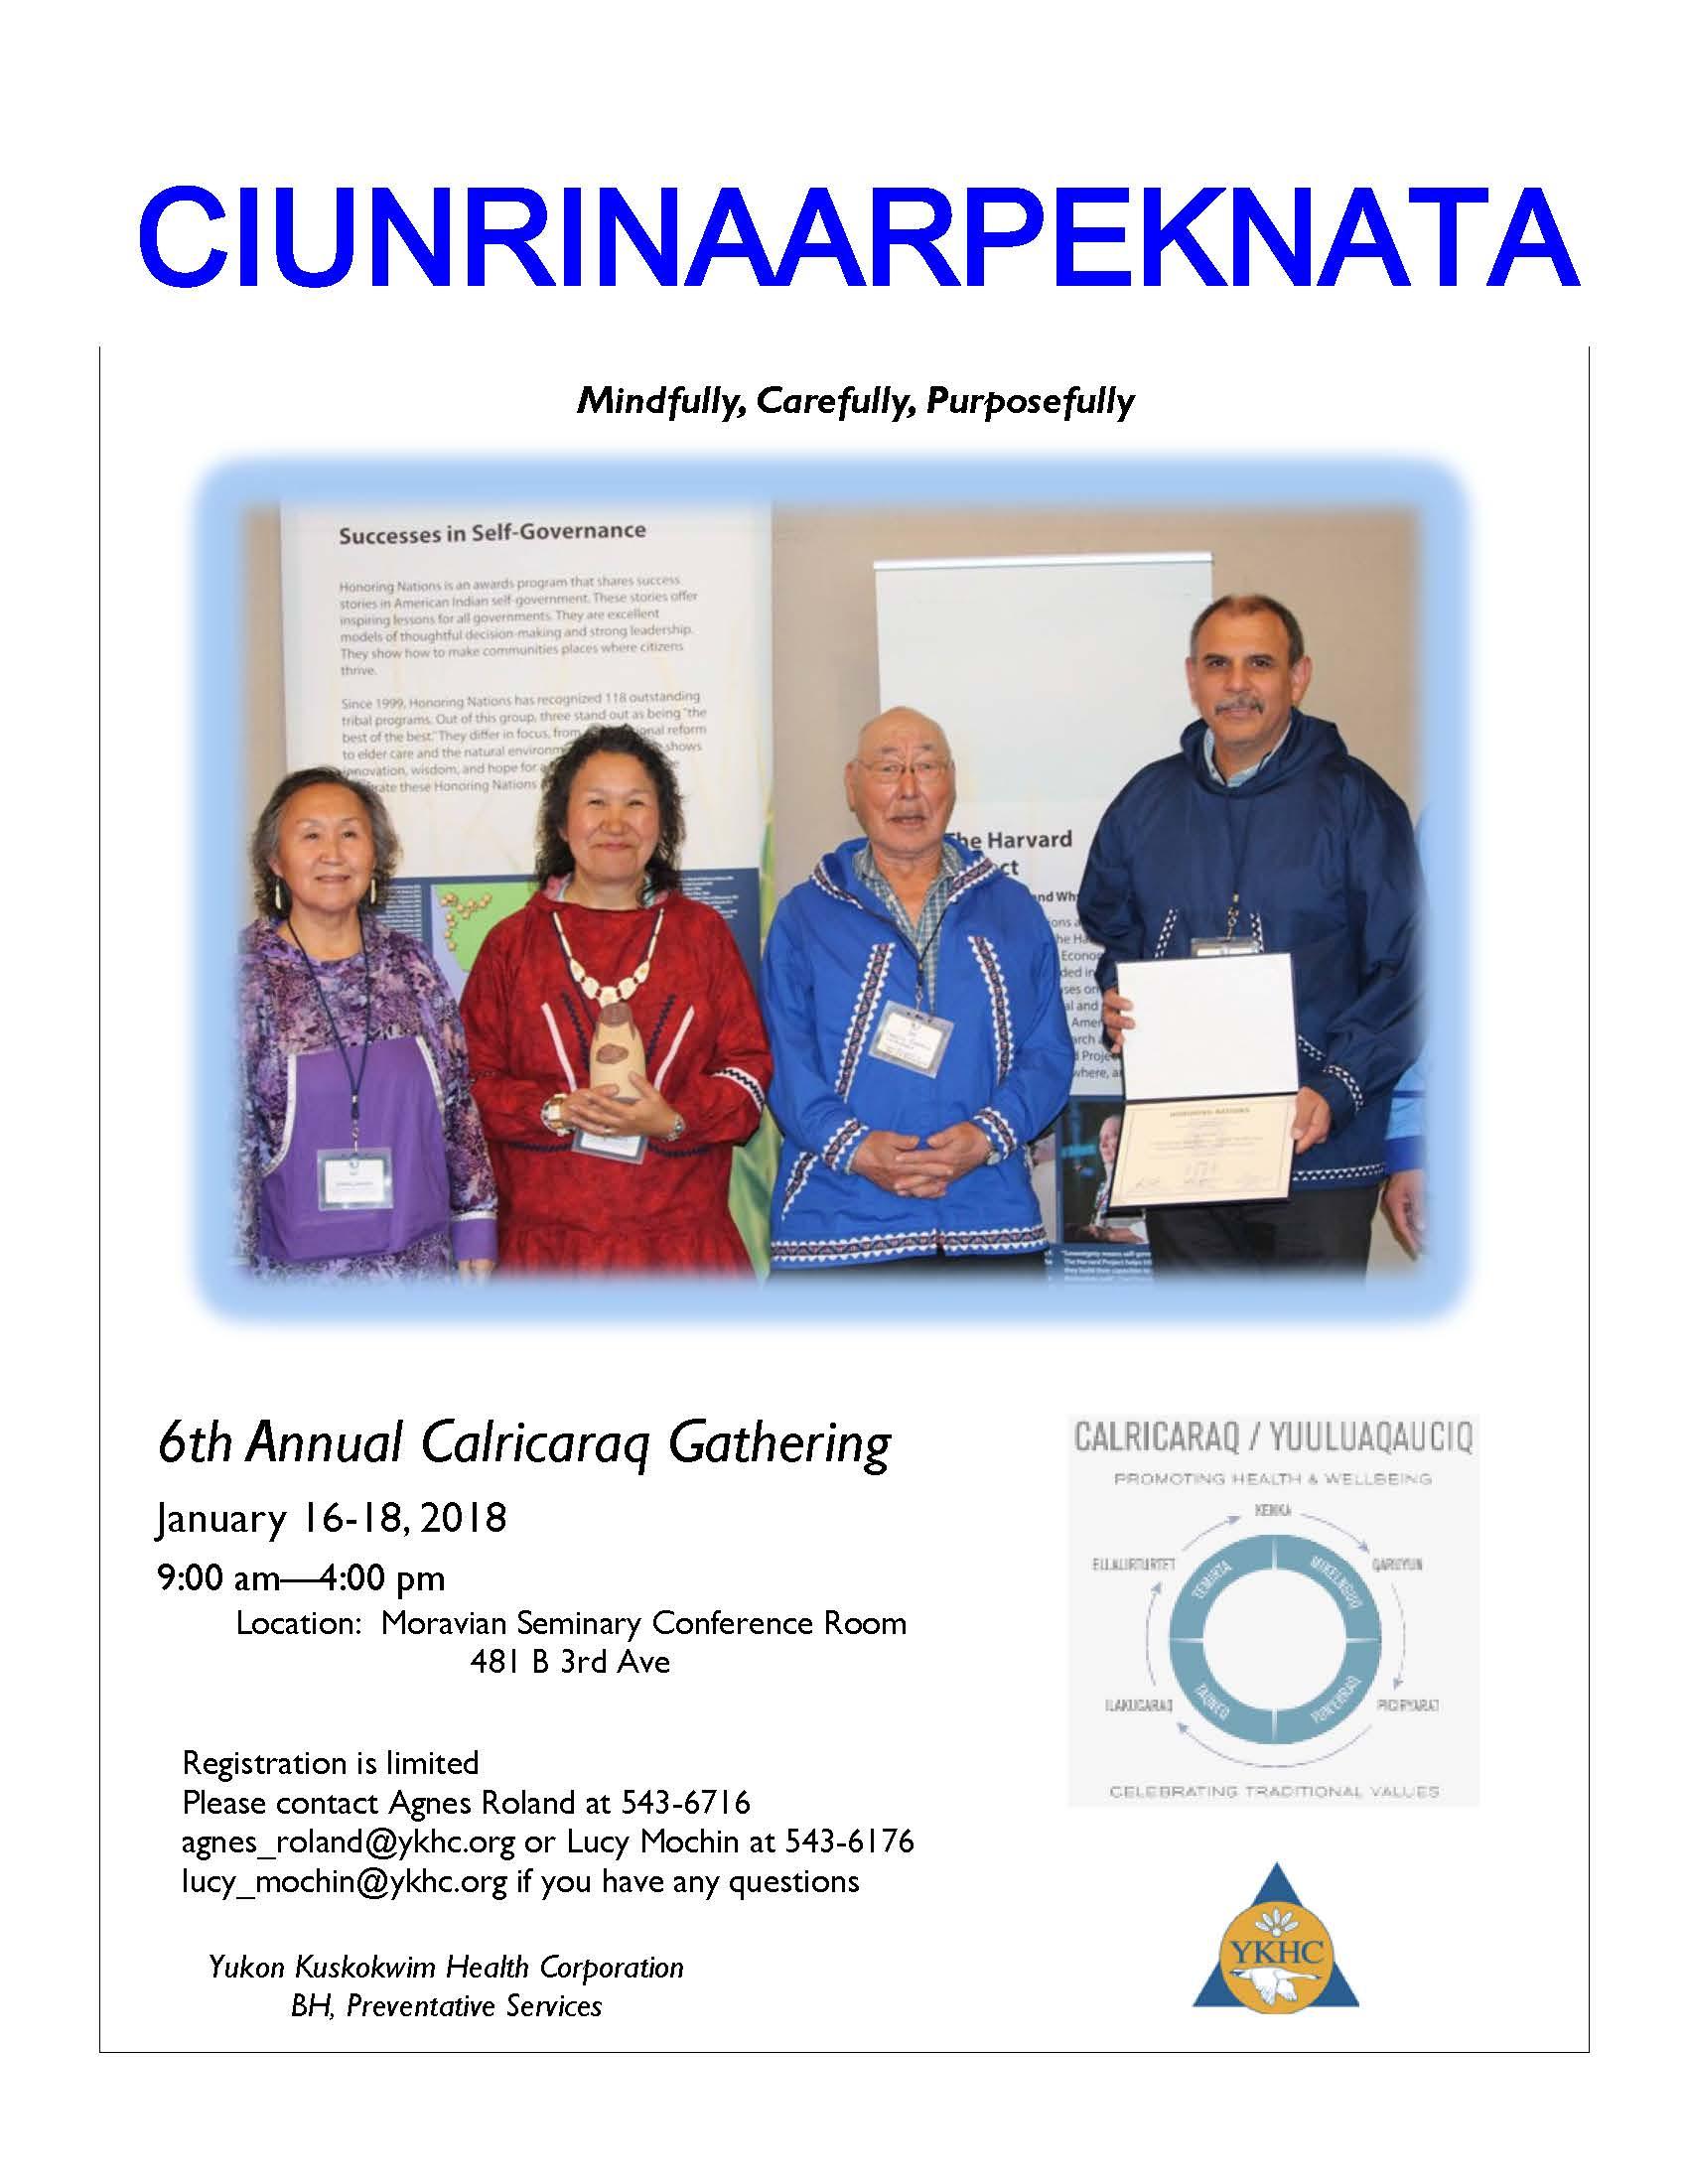 6th Annual Calricraq Gathering 2018.jpg